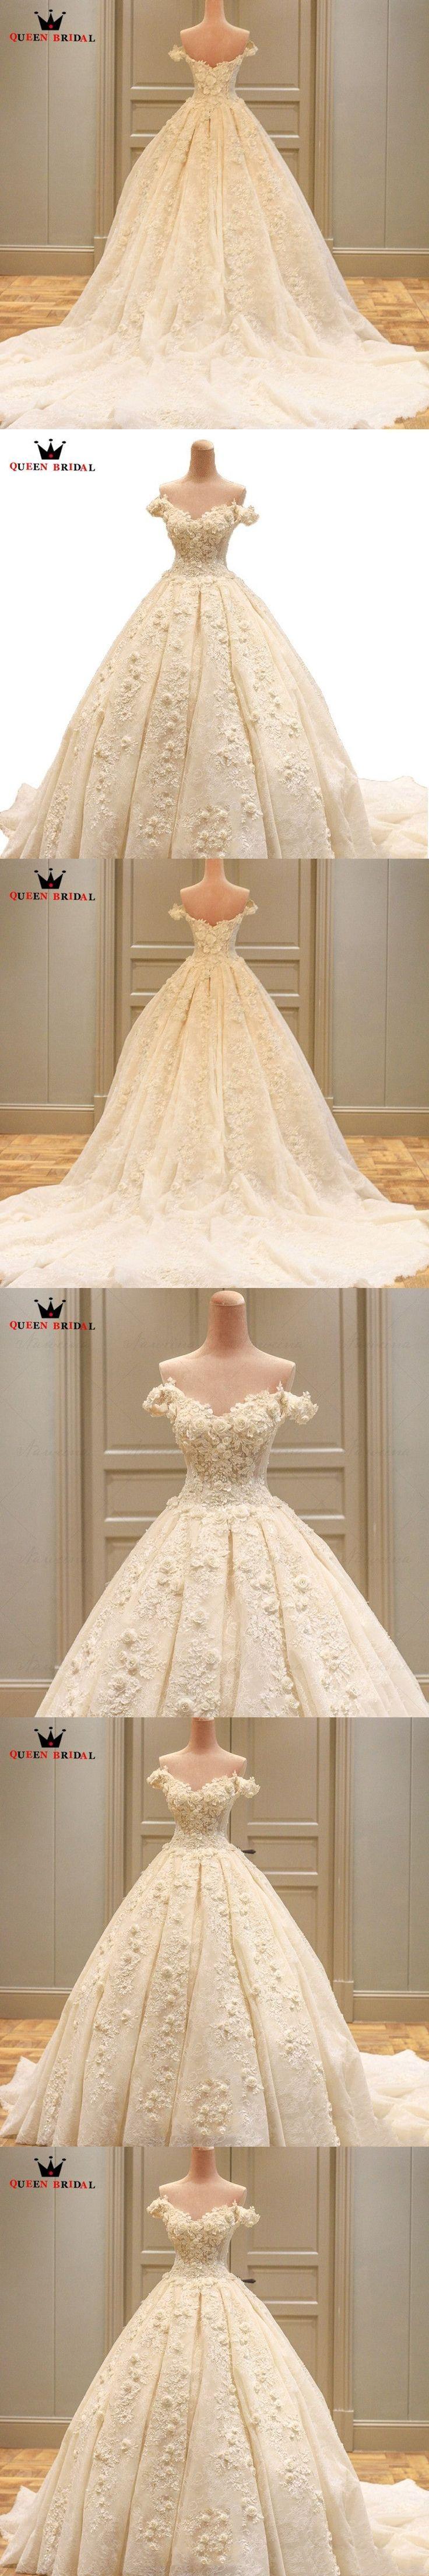 Vintage Wedding Dresses Ball Gown Cap Sleeve Lace Flowers Romantic Luxury Vestidos De Noiva Formal Bridal Gown Custom Made XJ52